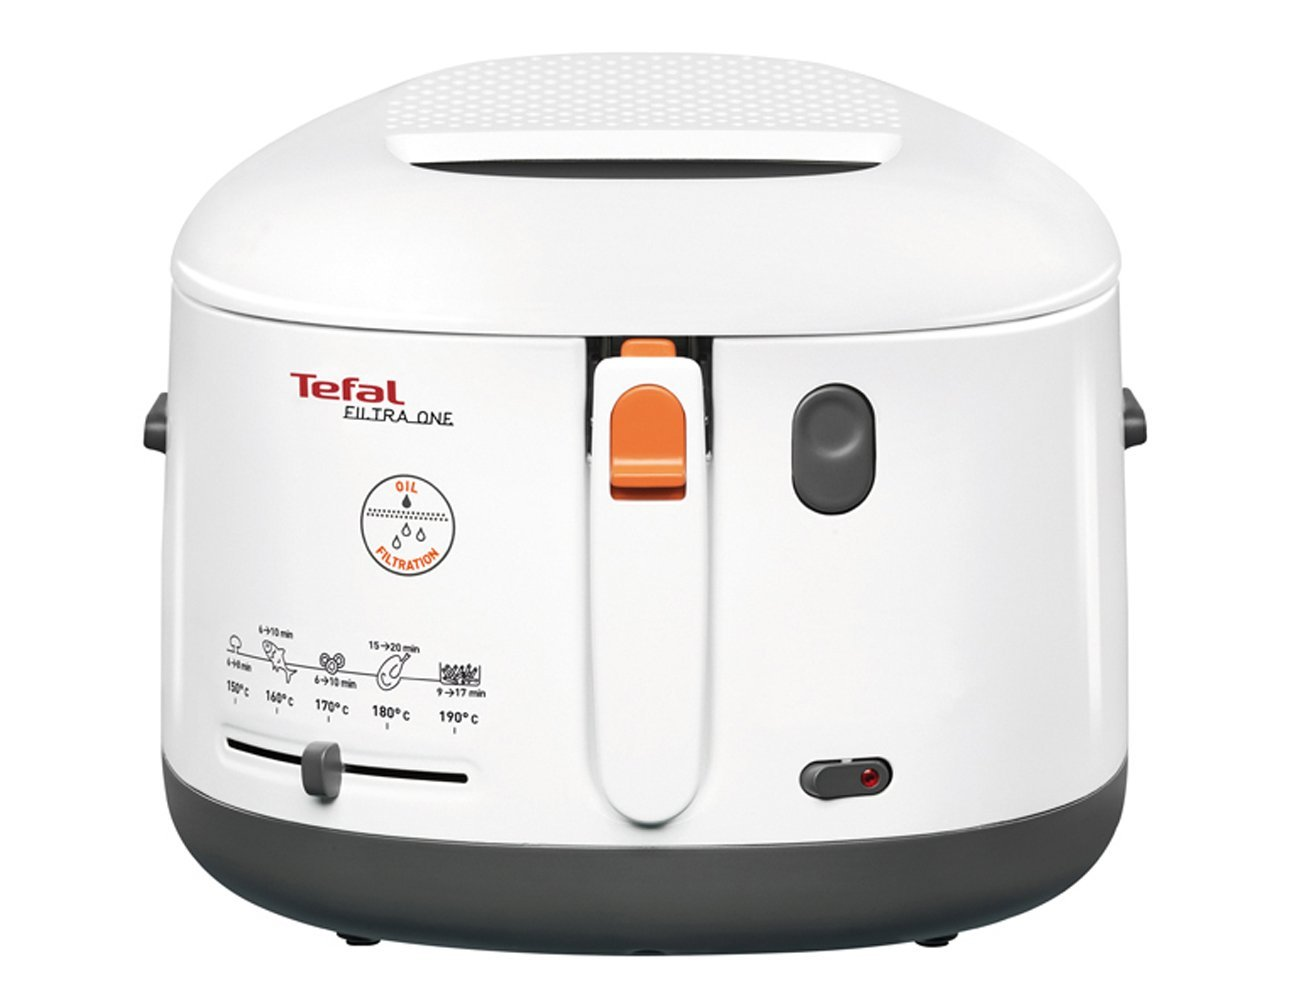 Tefal FF1631 Friteuse im Test